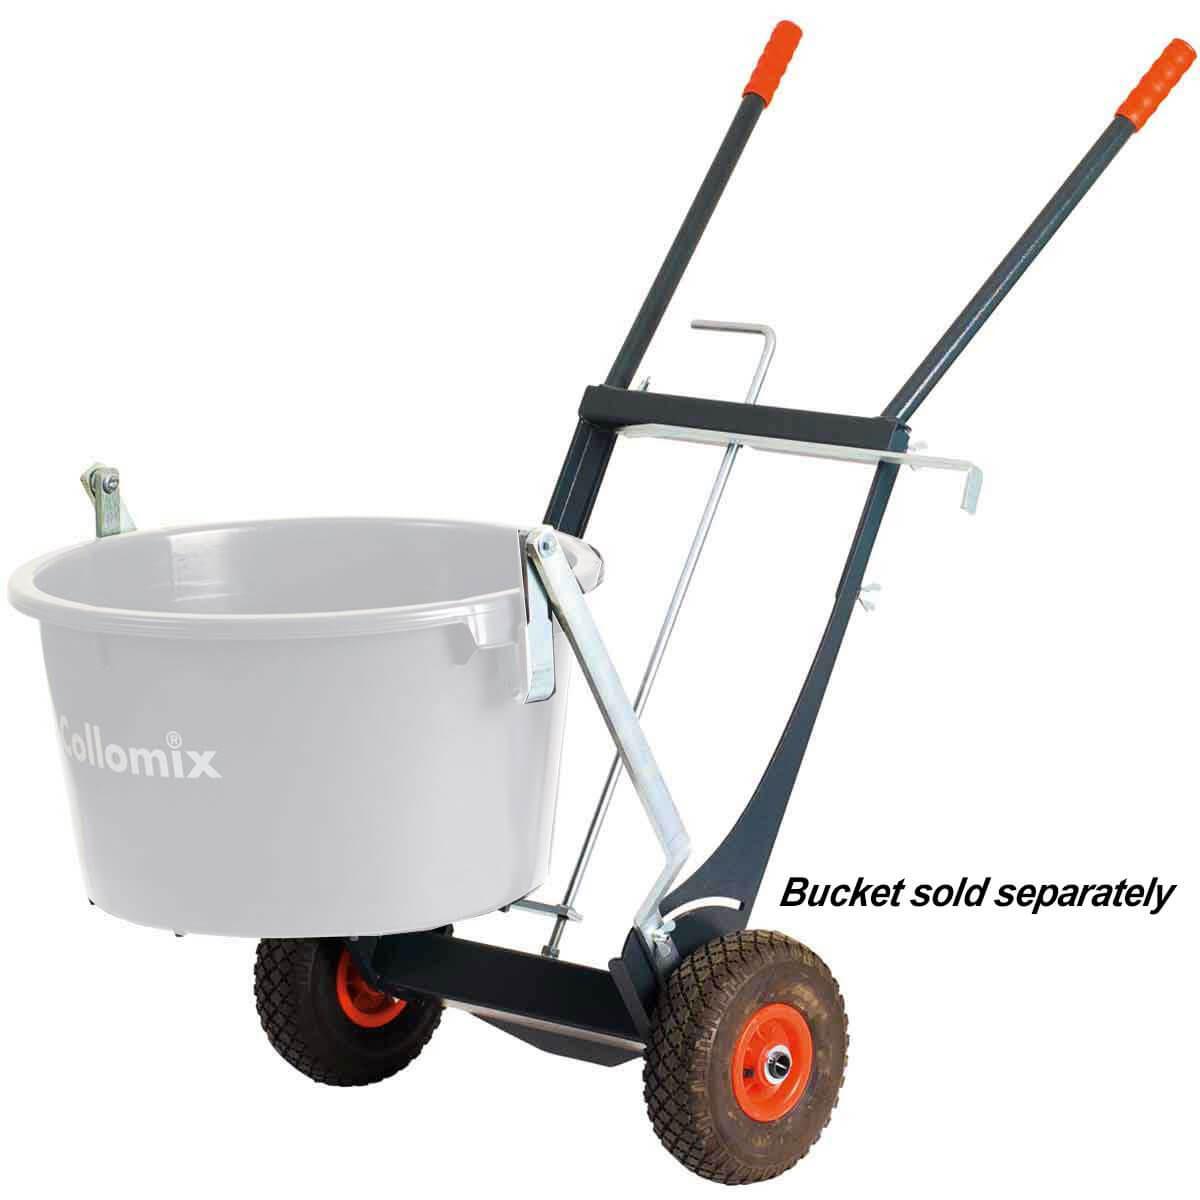 collomix Bucketcart dump